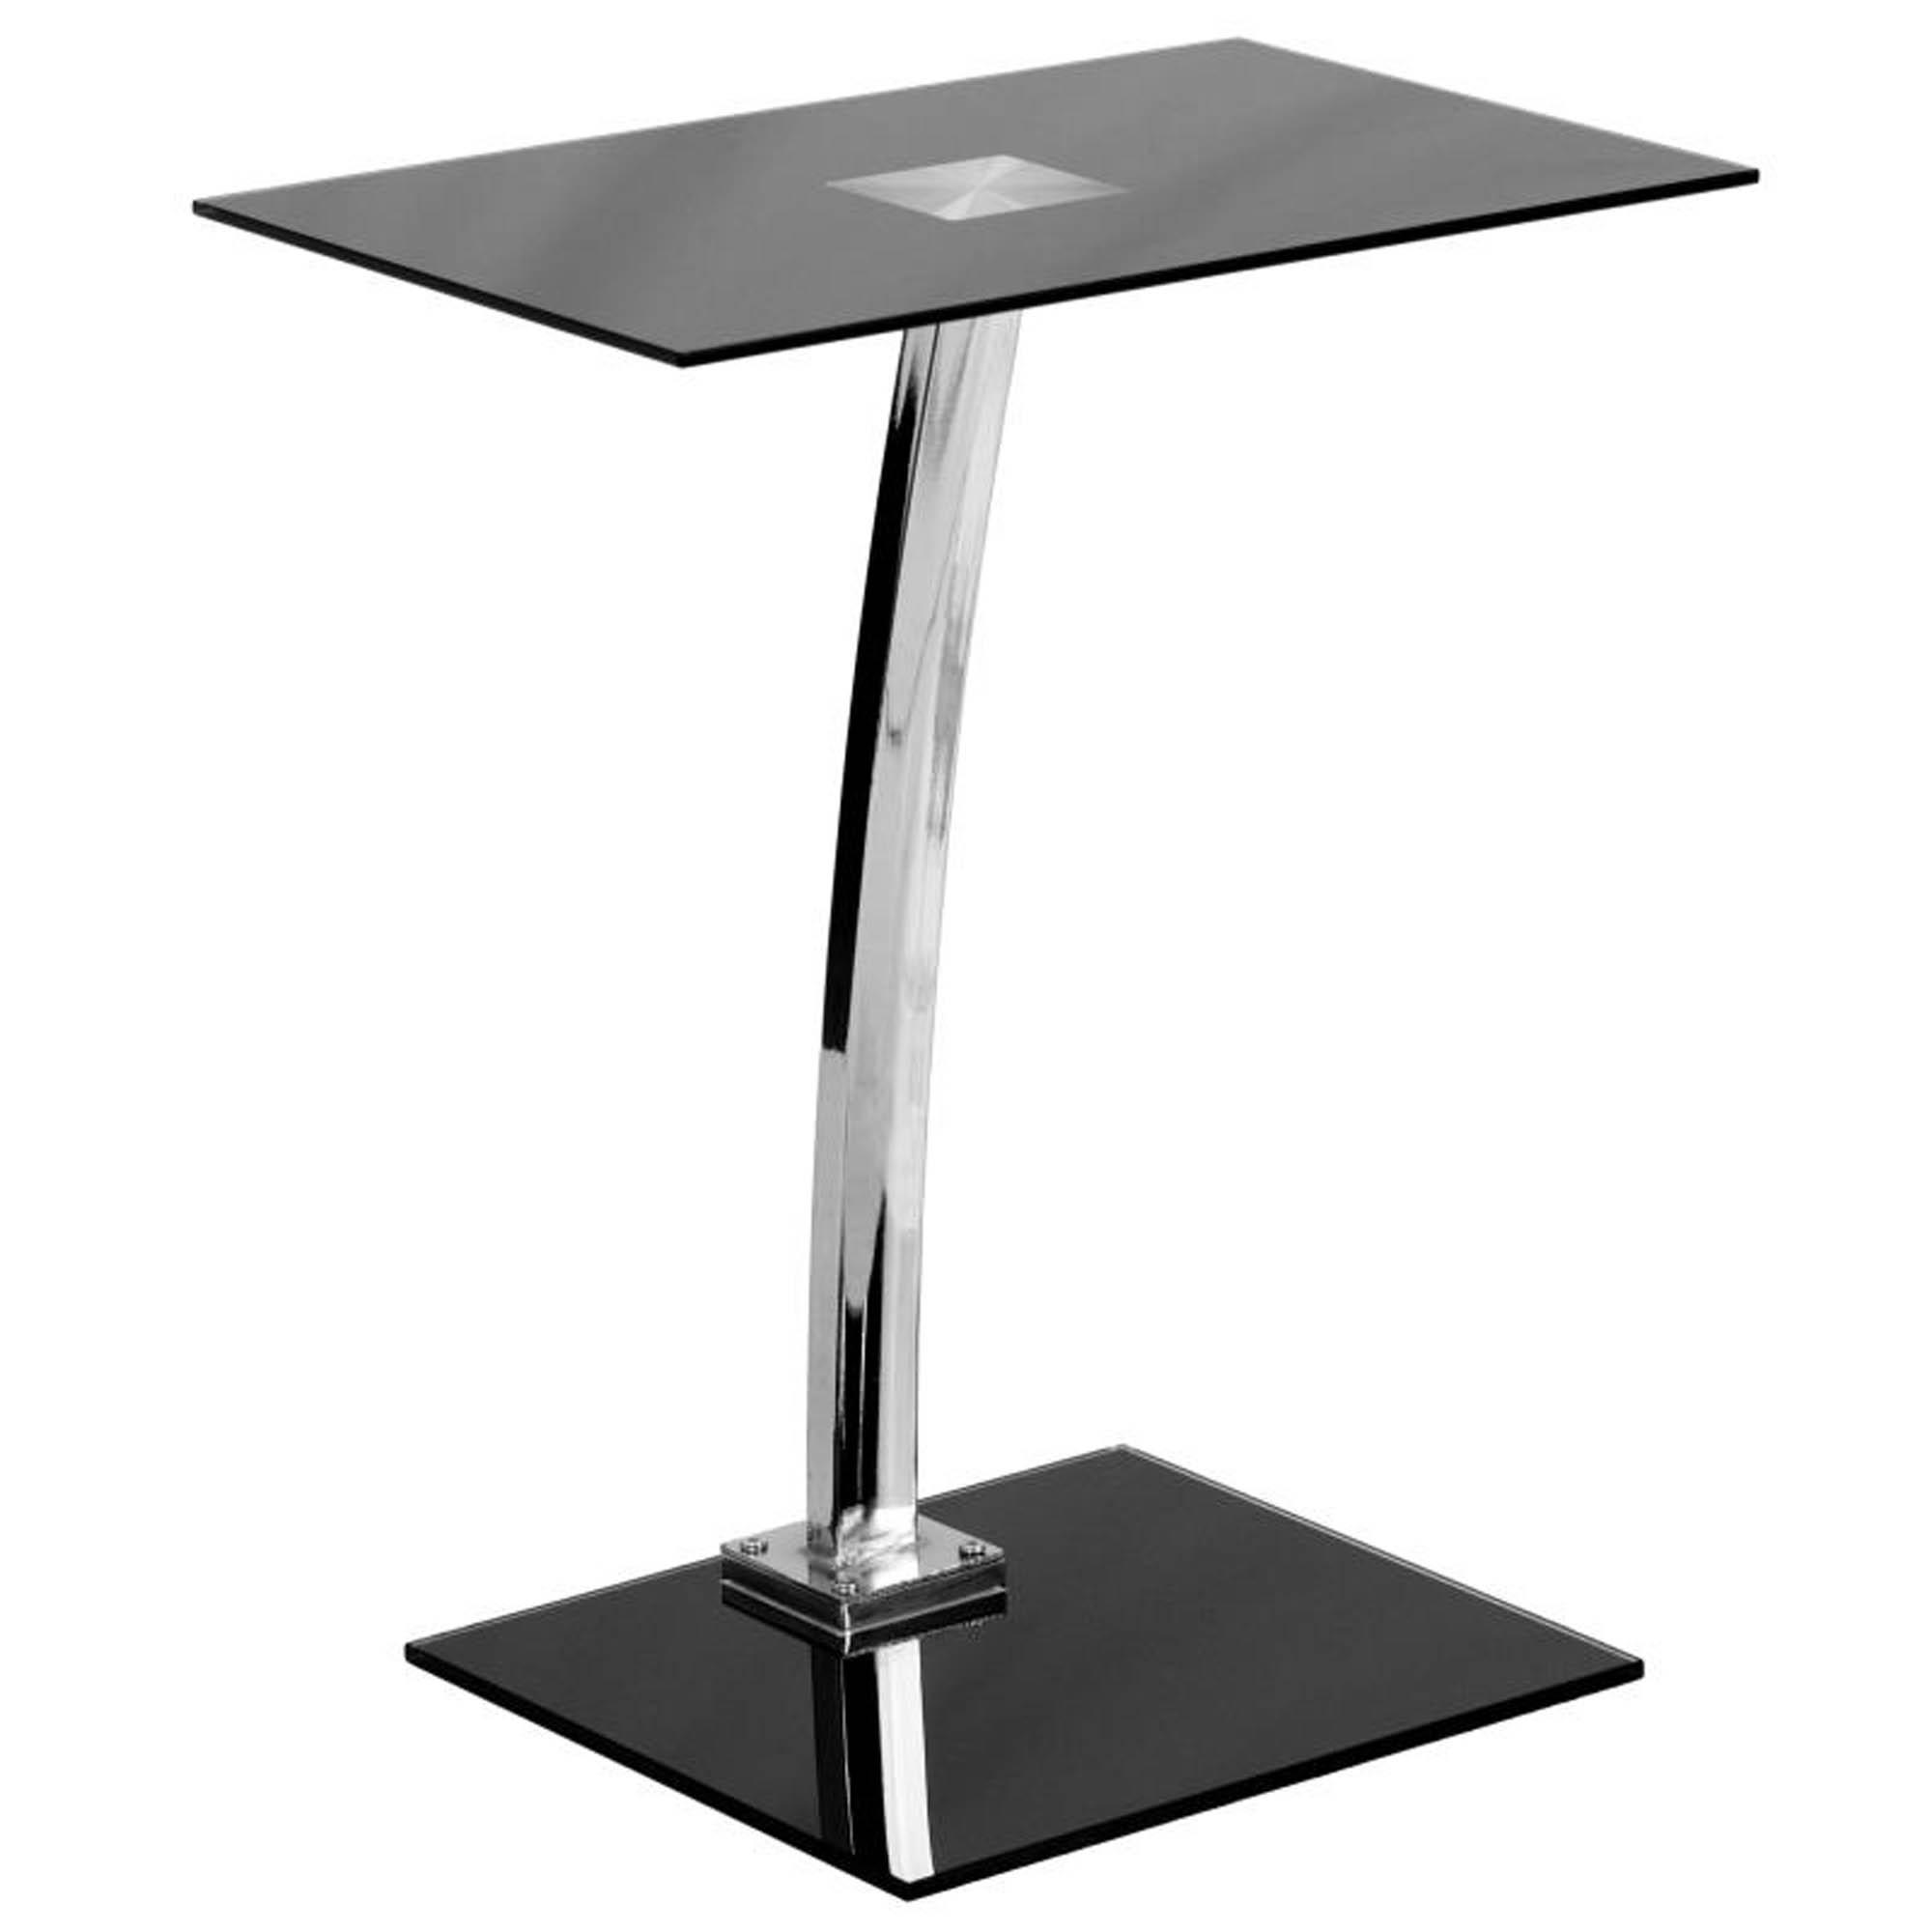 Offex NAN-LT-07-GG Laptop Computer Desk with Silk Black Tempered Glass Top